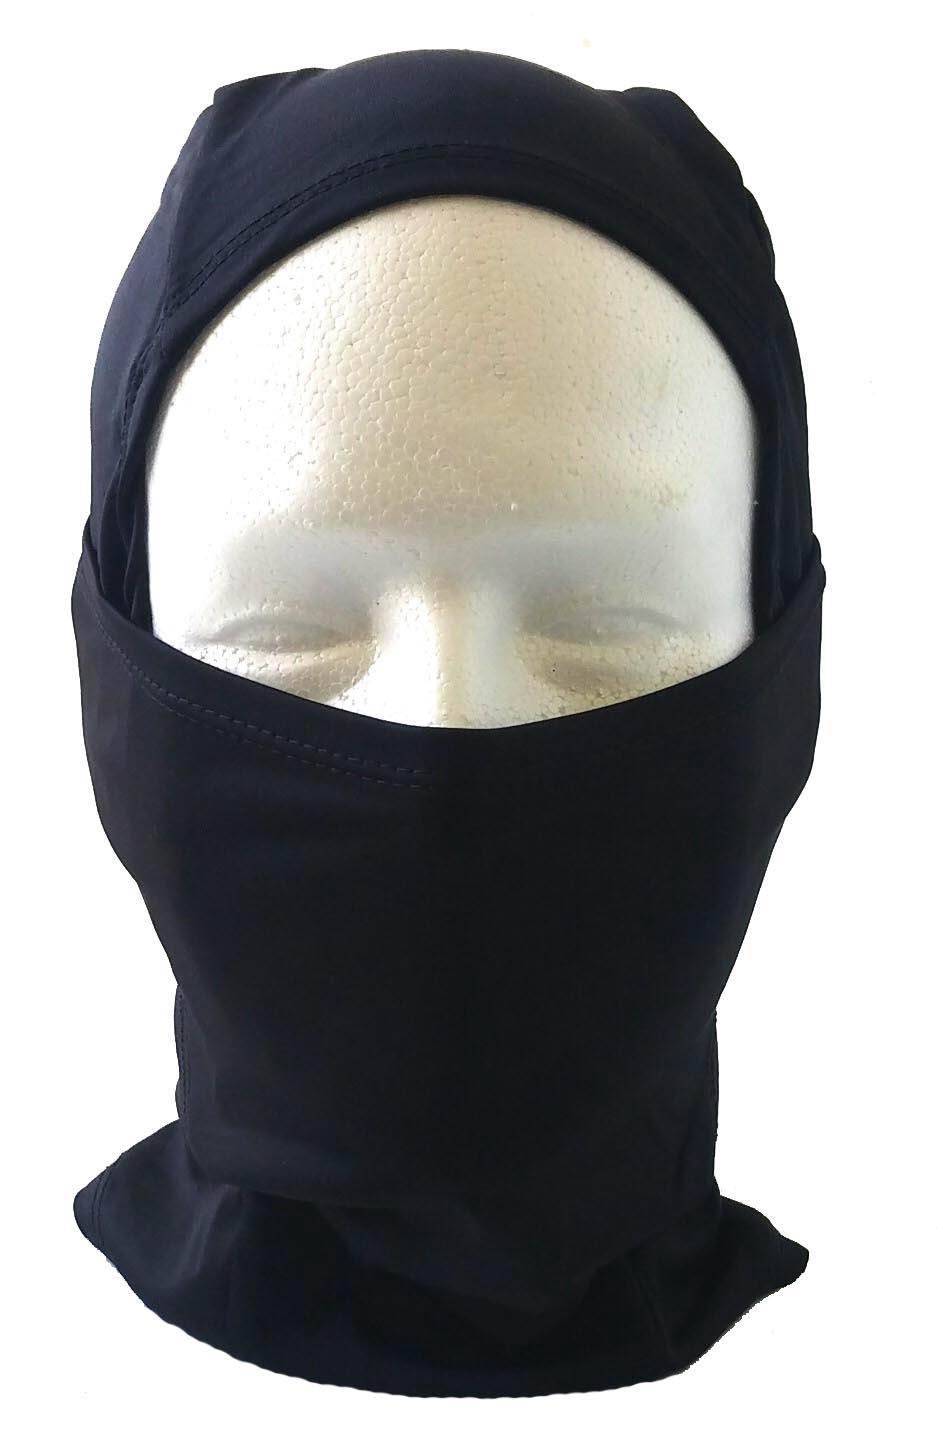 Ninja style balaclava-Black